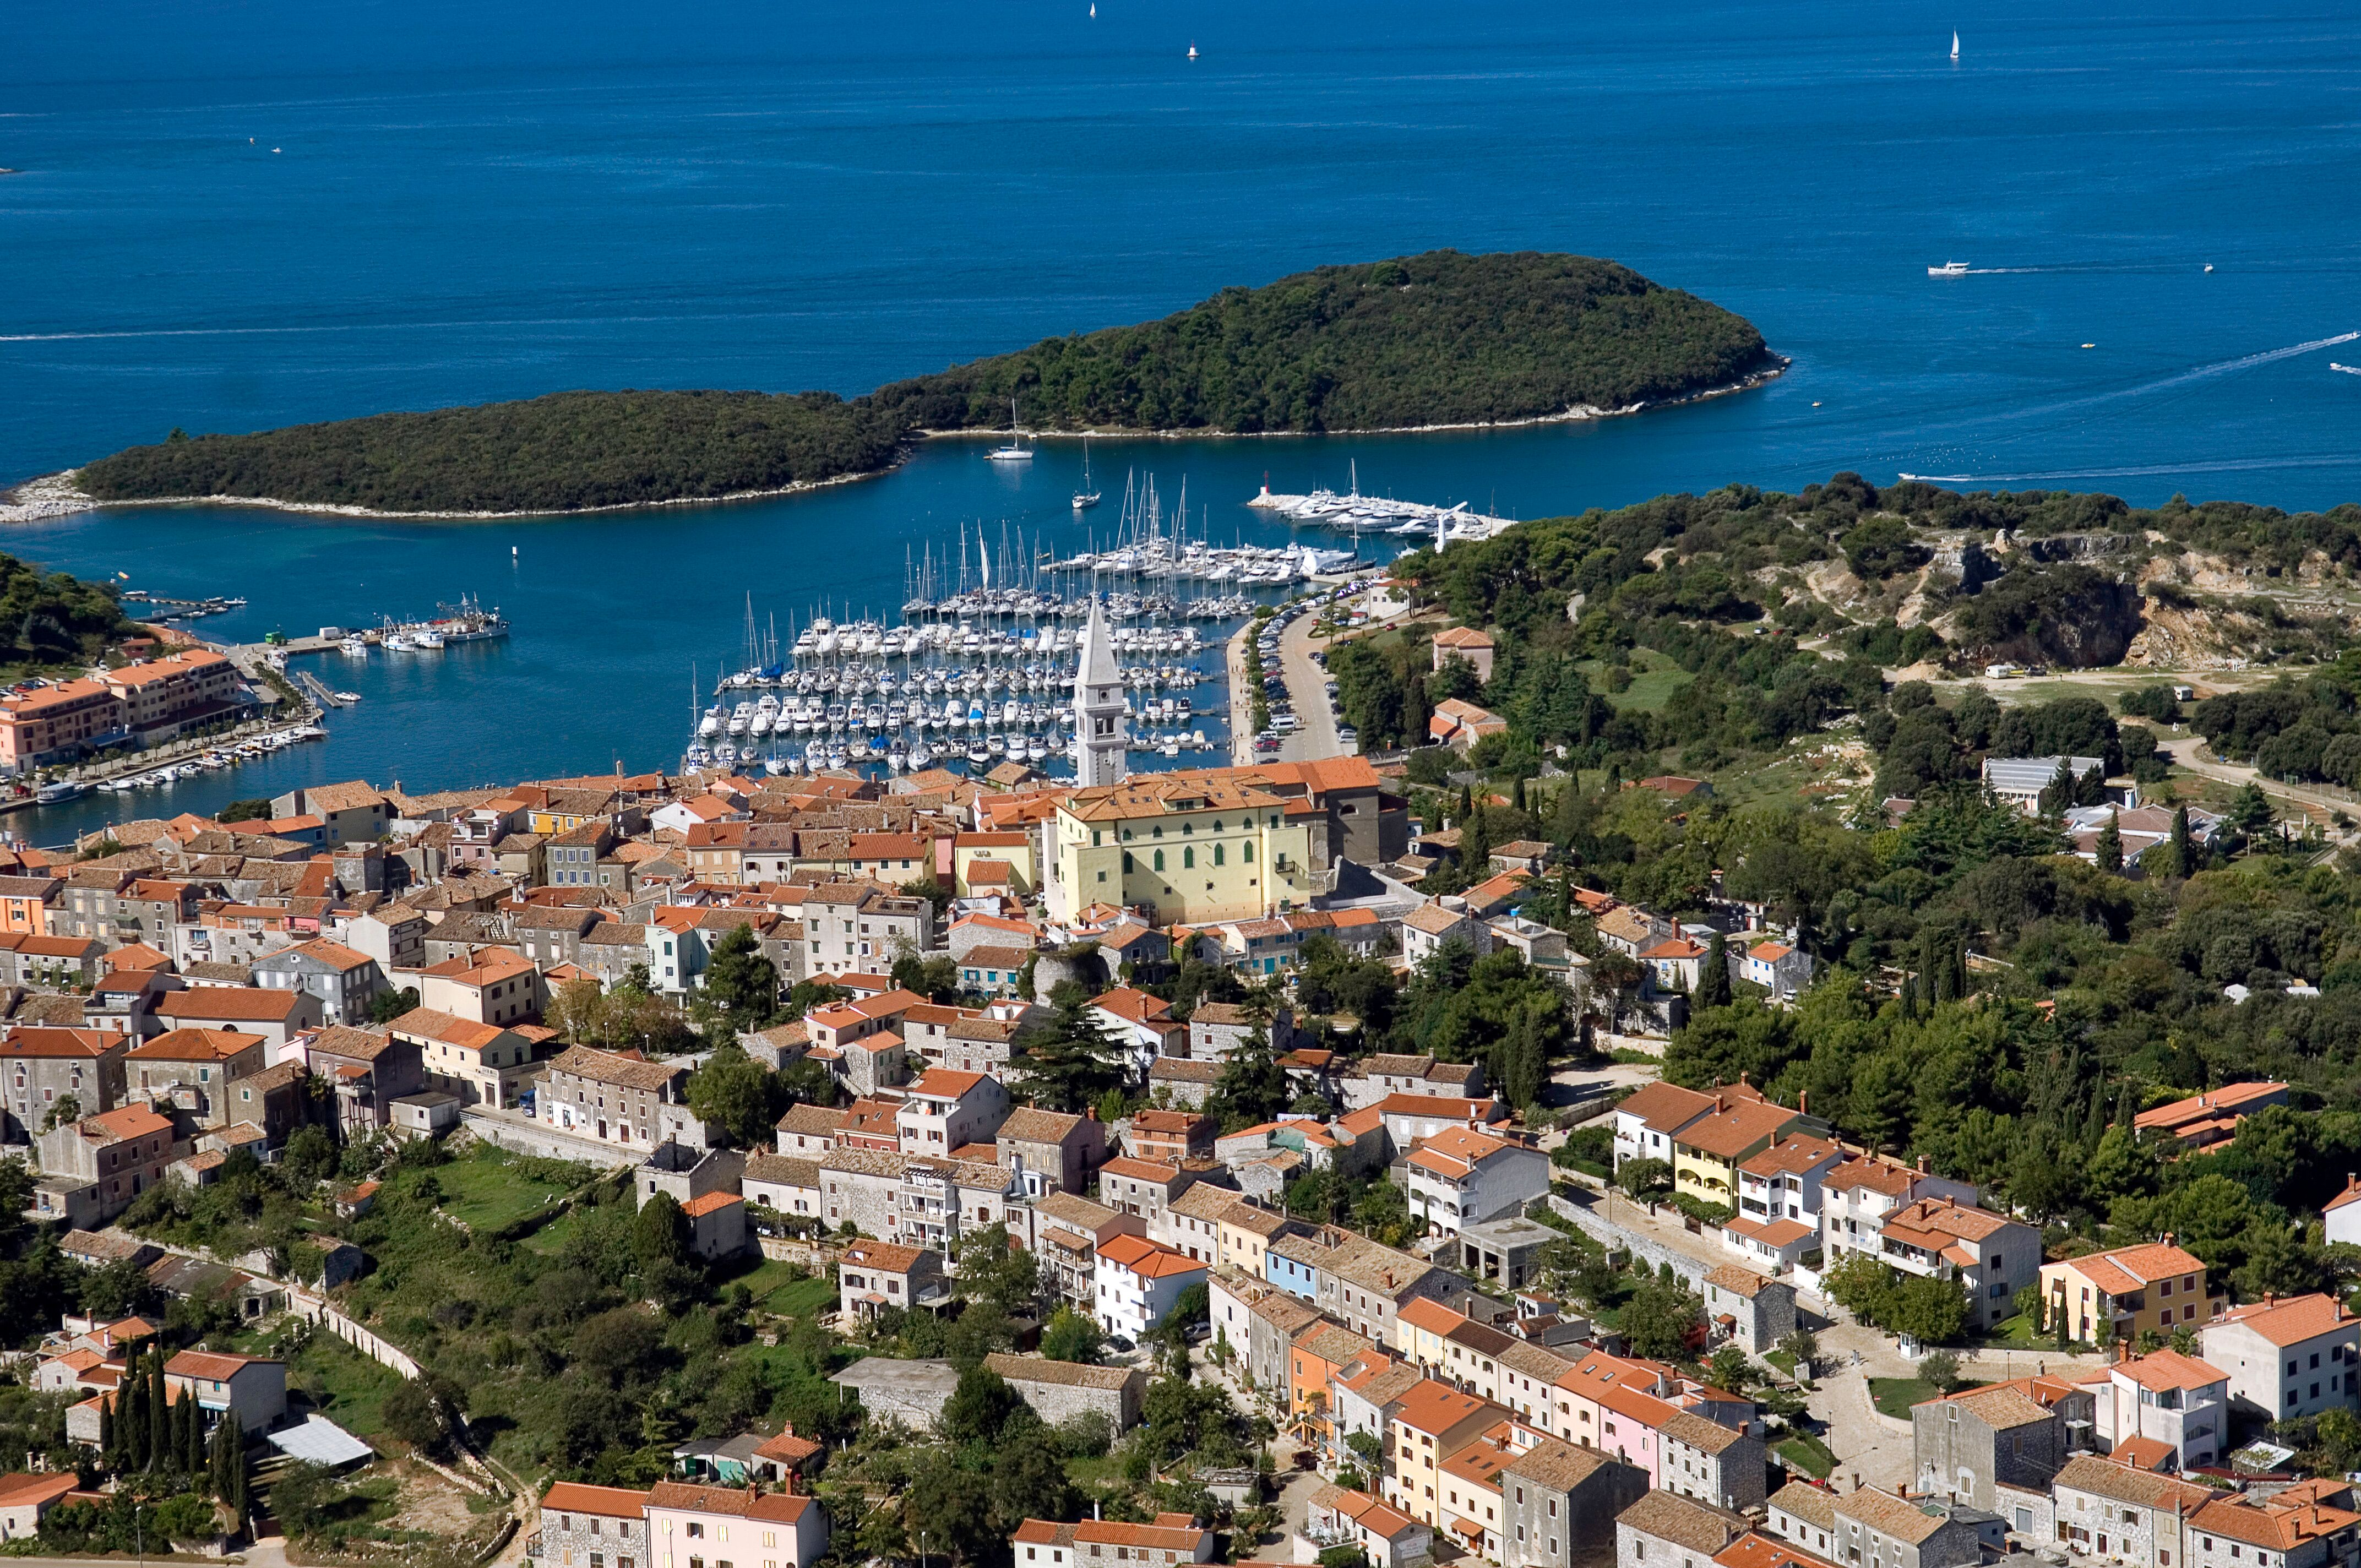 Vrsar: Urlaub in Kroatien